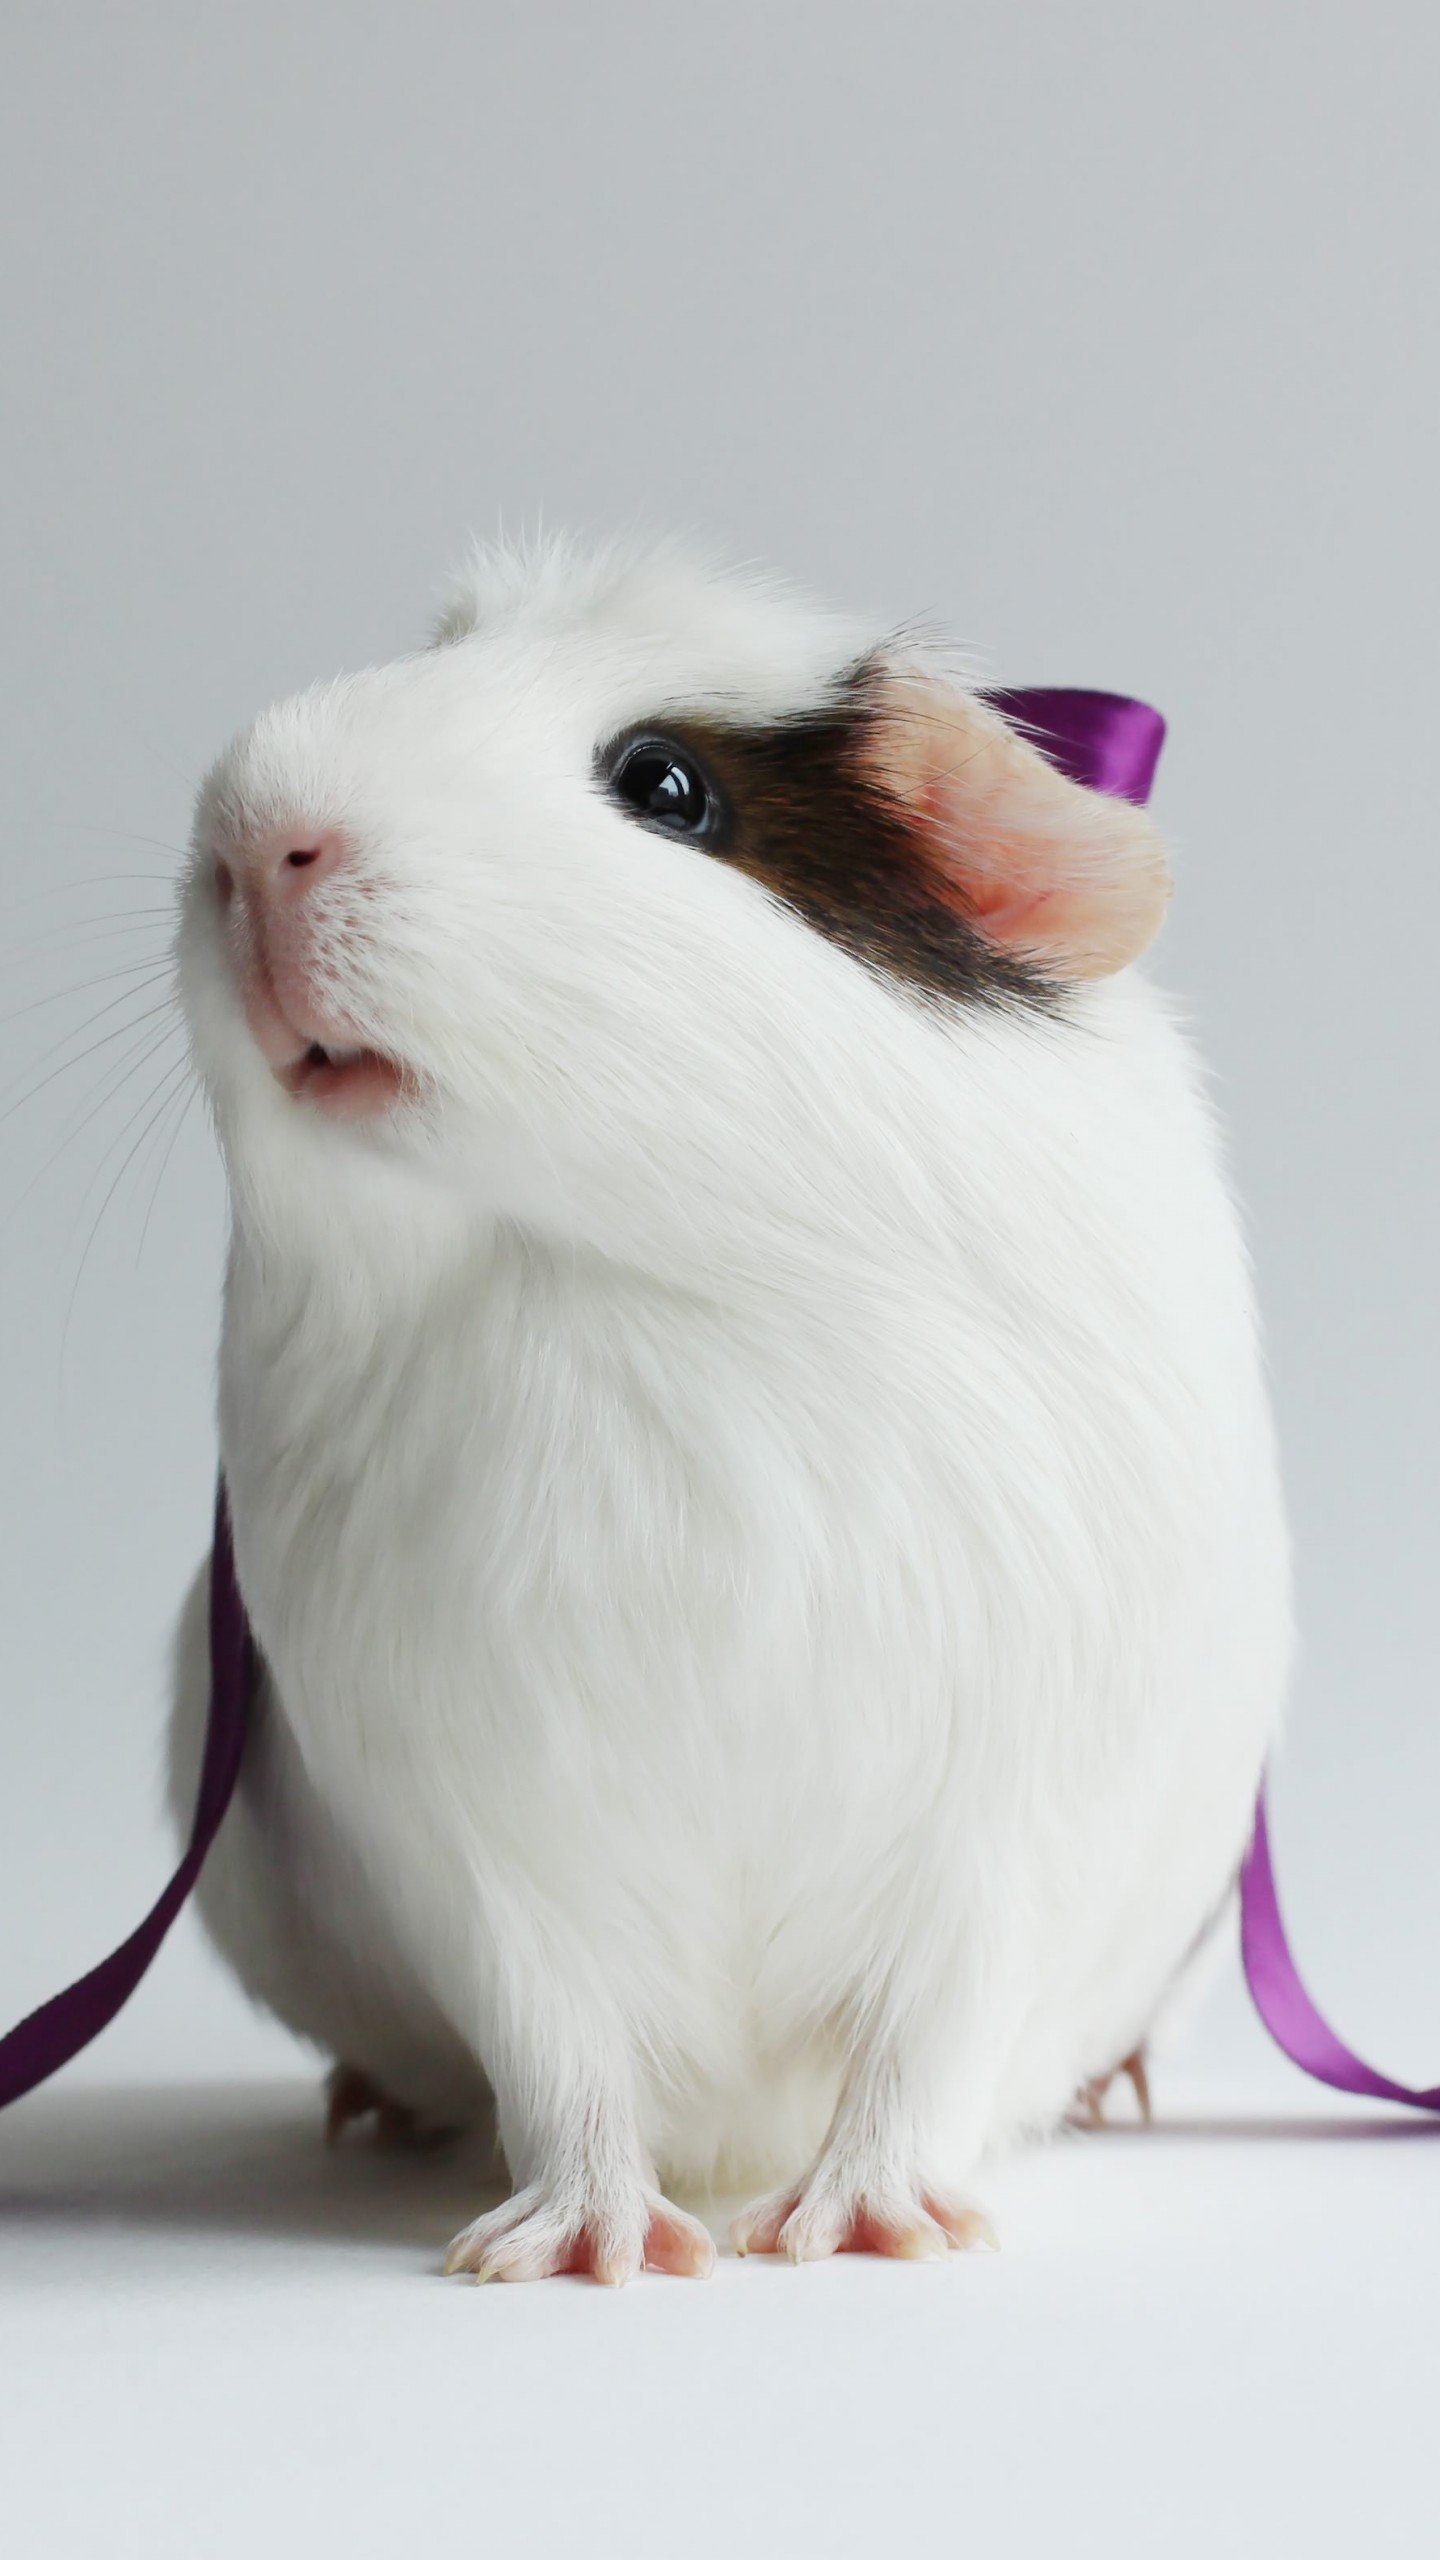 Wallpaper Hamster Cute Hamster White Close Up Purple